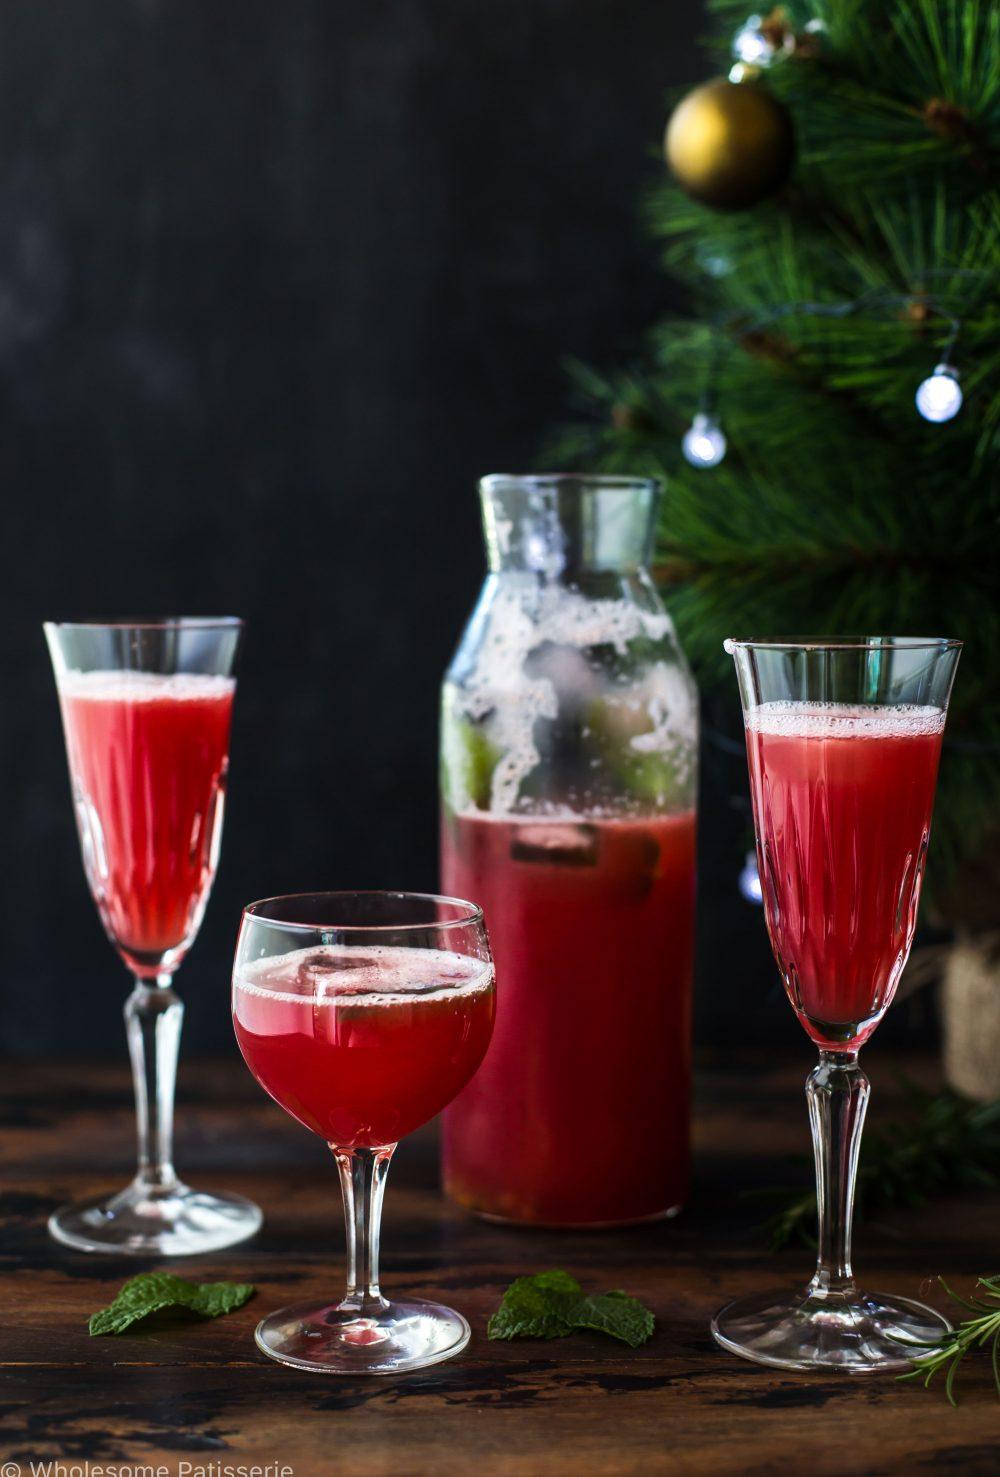 christmas-day-punch-cranberry-pineapple-kombucha-punch-non-alcoholic-festive-passionfruit-refreshing